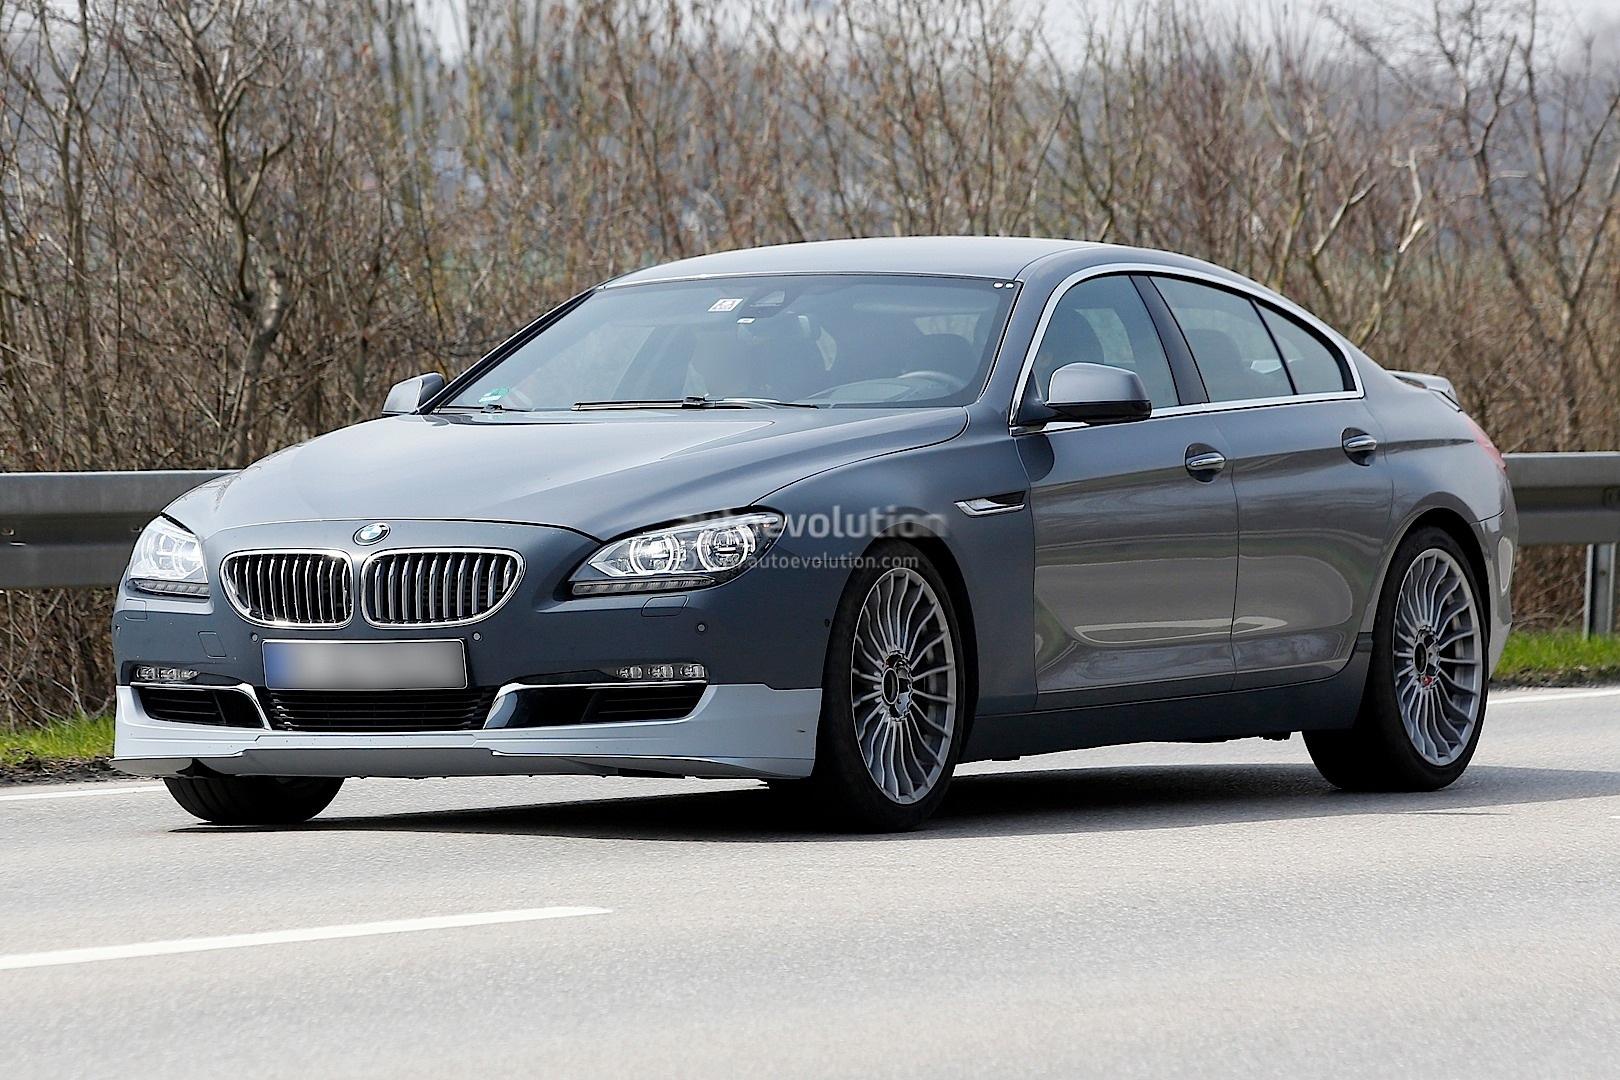 2012 - [BMW] Série 6 / M6 Gran Coupé [F06] - Page 10 Spyshots-alpina-b6-biturbo-gran-coupe_2